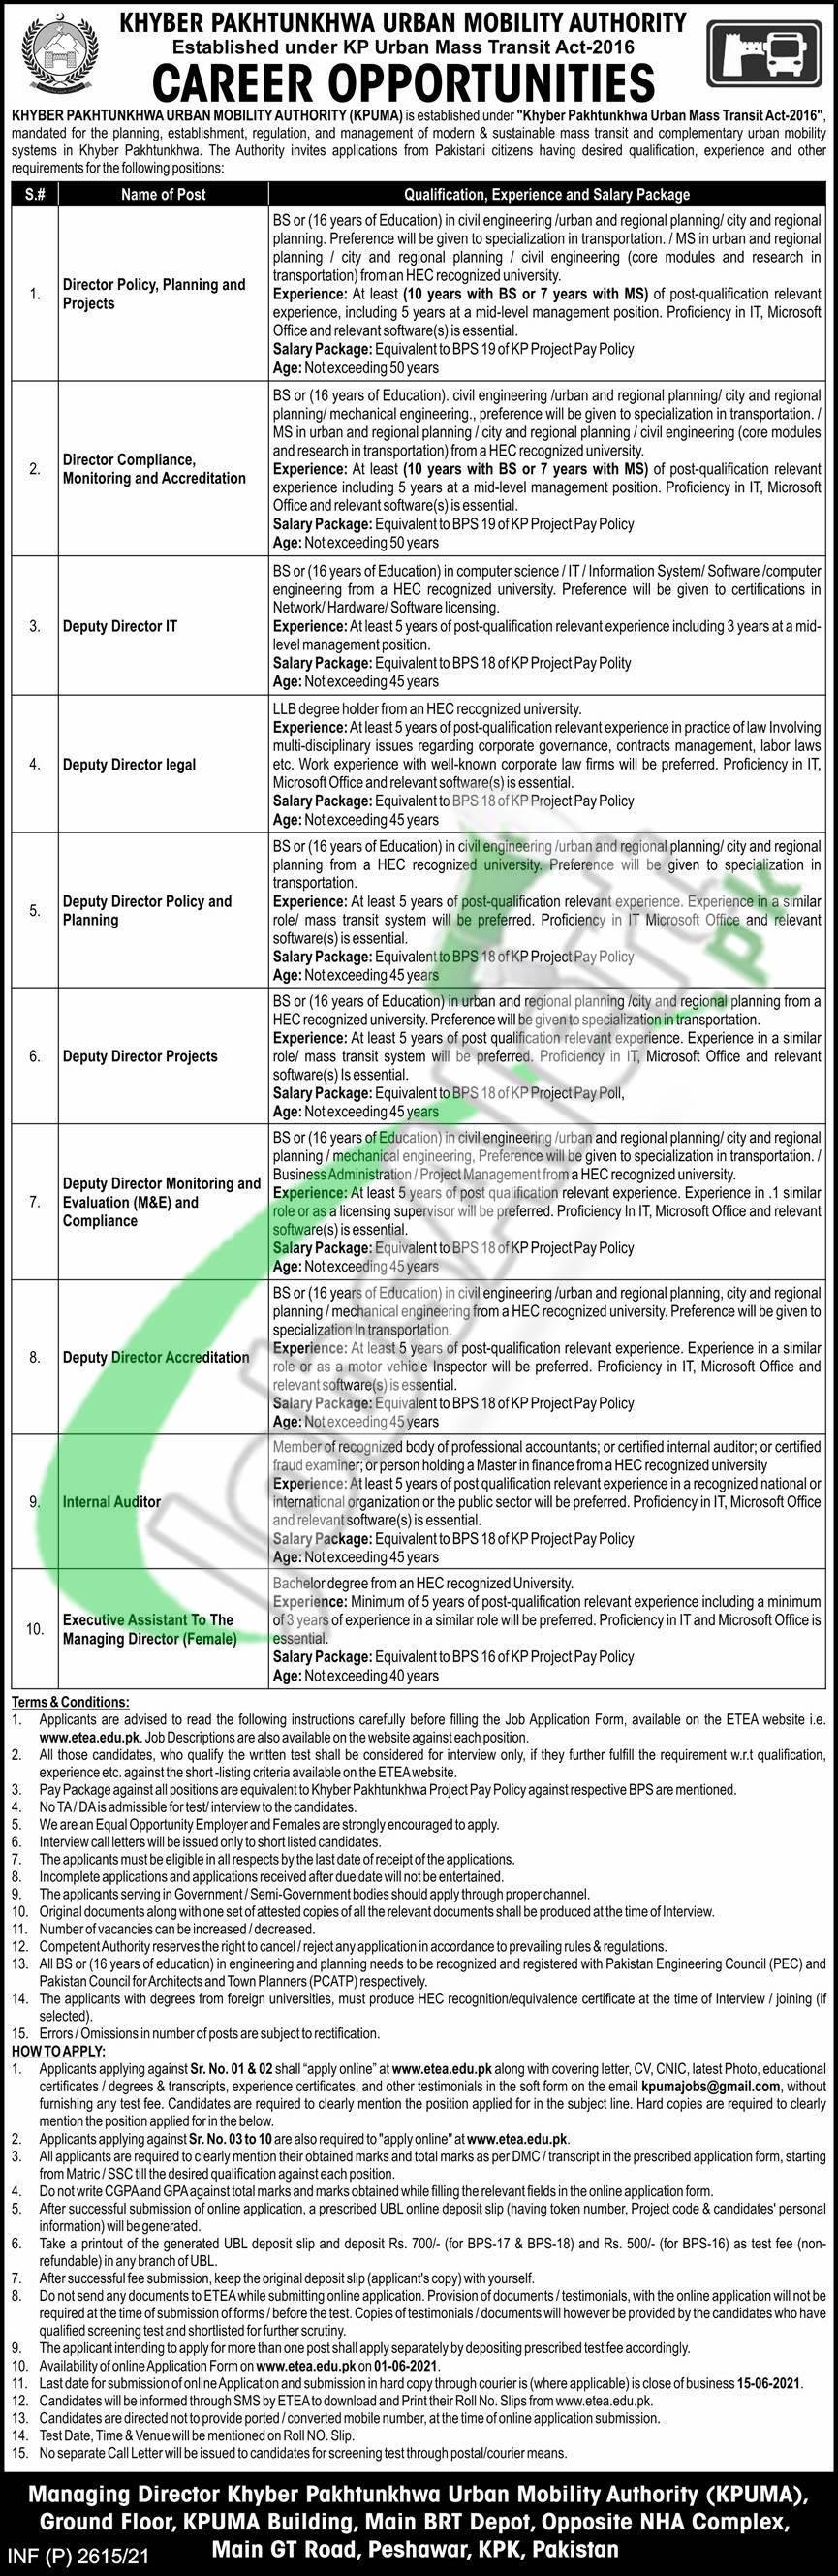 Khyber Pakhtunkhwa Urban Mobility Authority Jobs